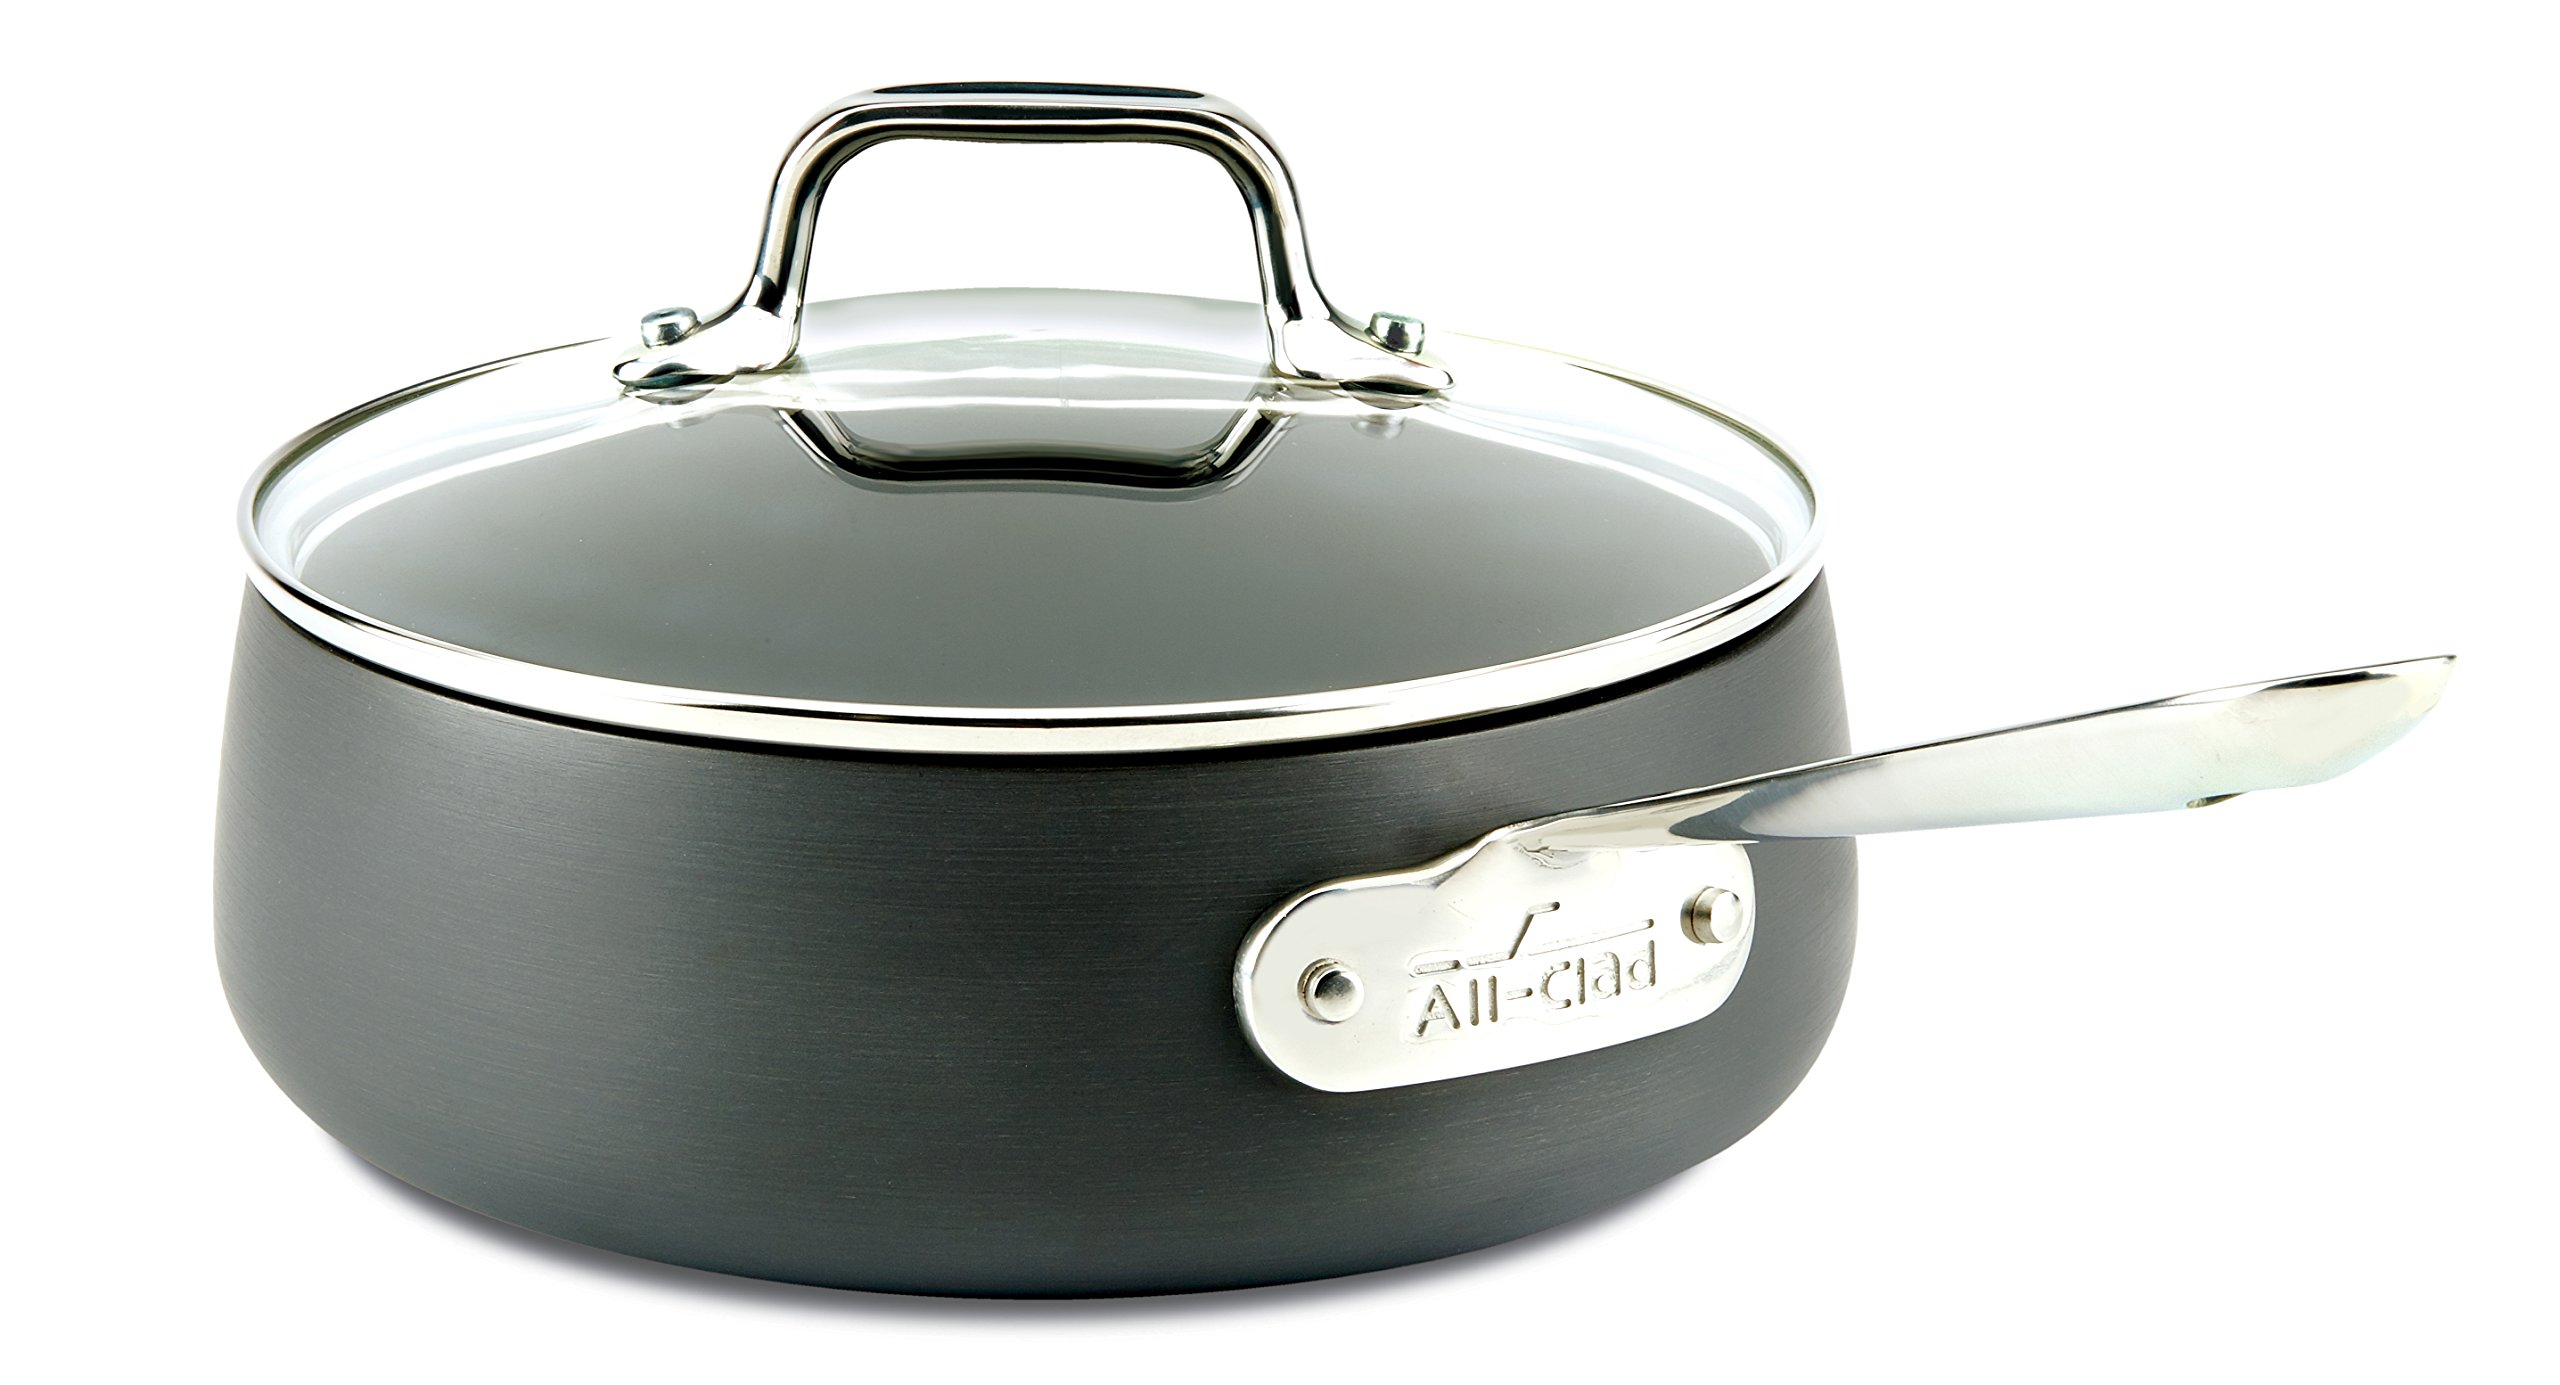 All-Clad E7852664 HA1 Hard Anodized Nonstick Dishwasher Safe PFOA Free Sauce Pan Cookware, 2.5-Quart, Black